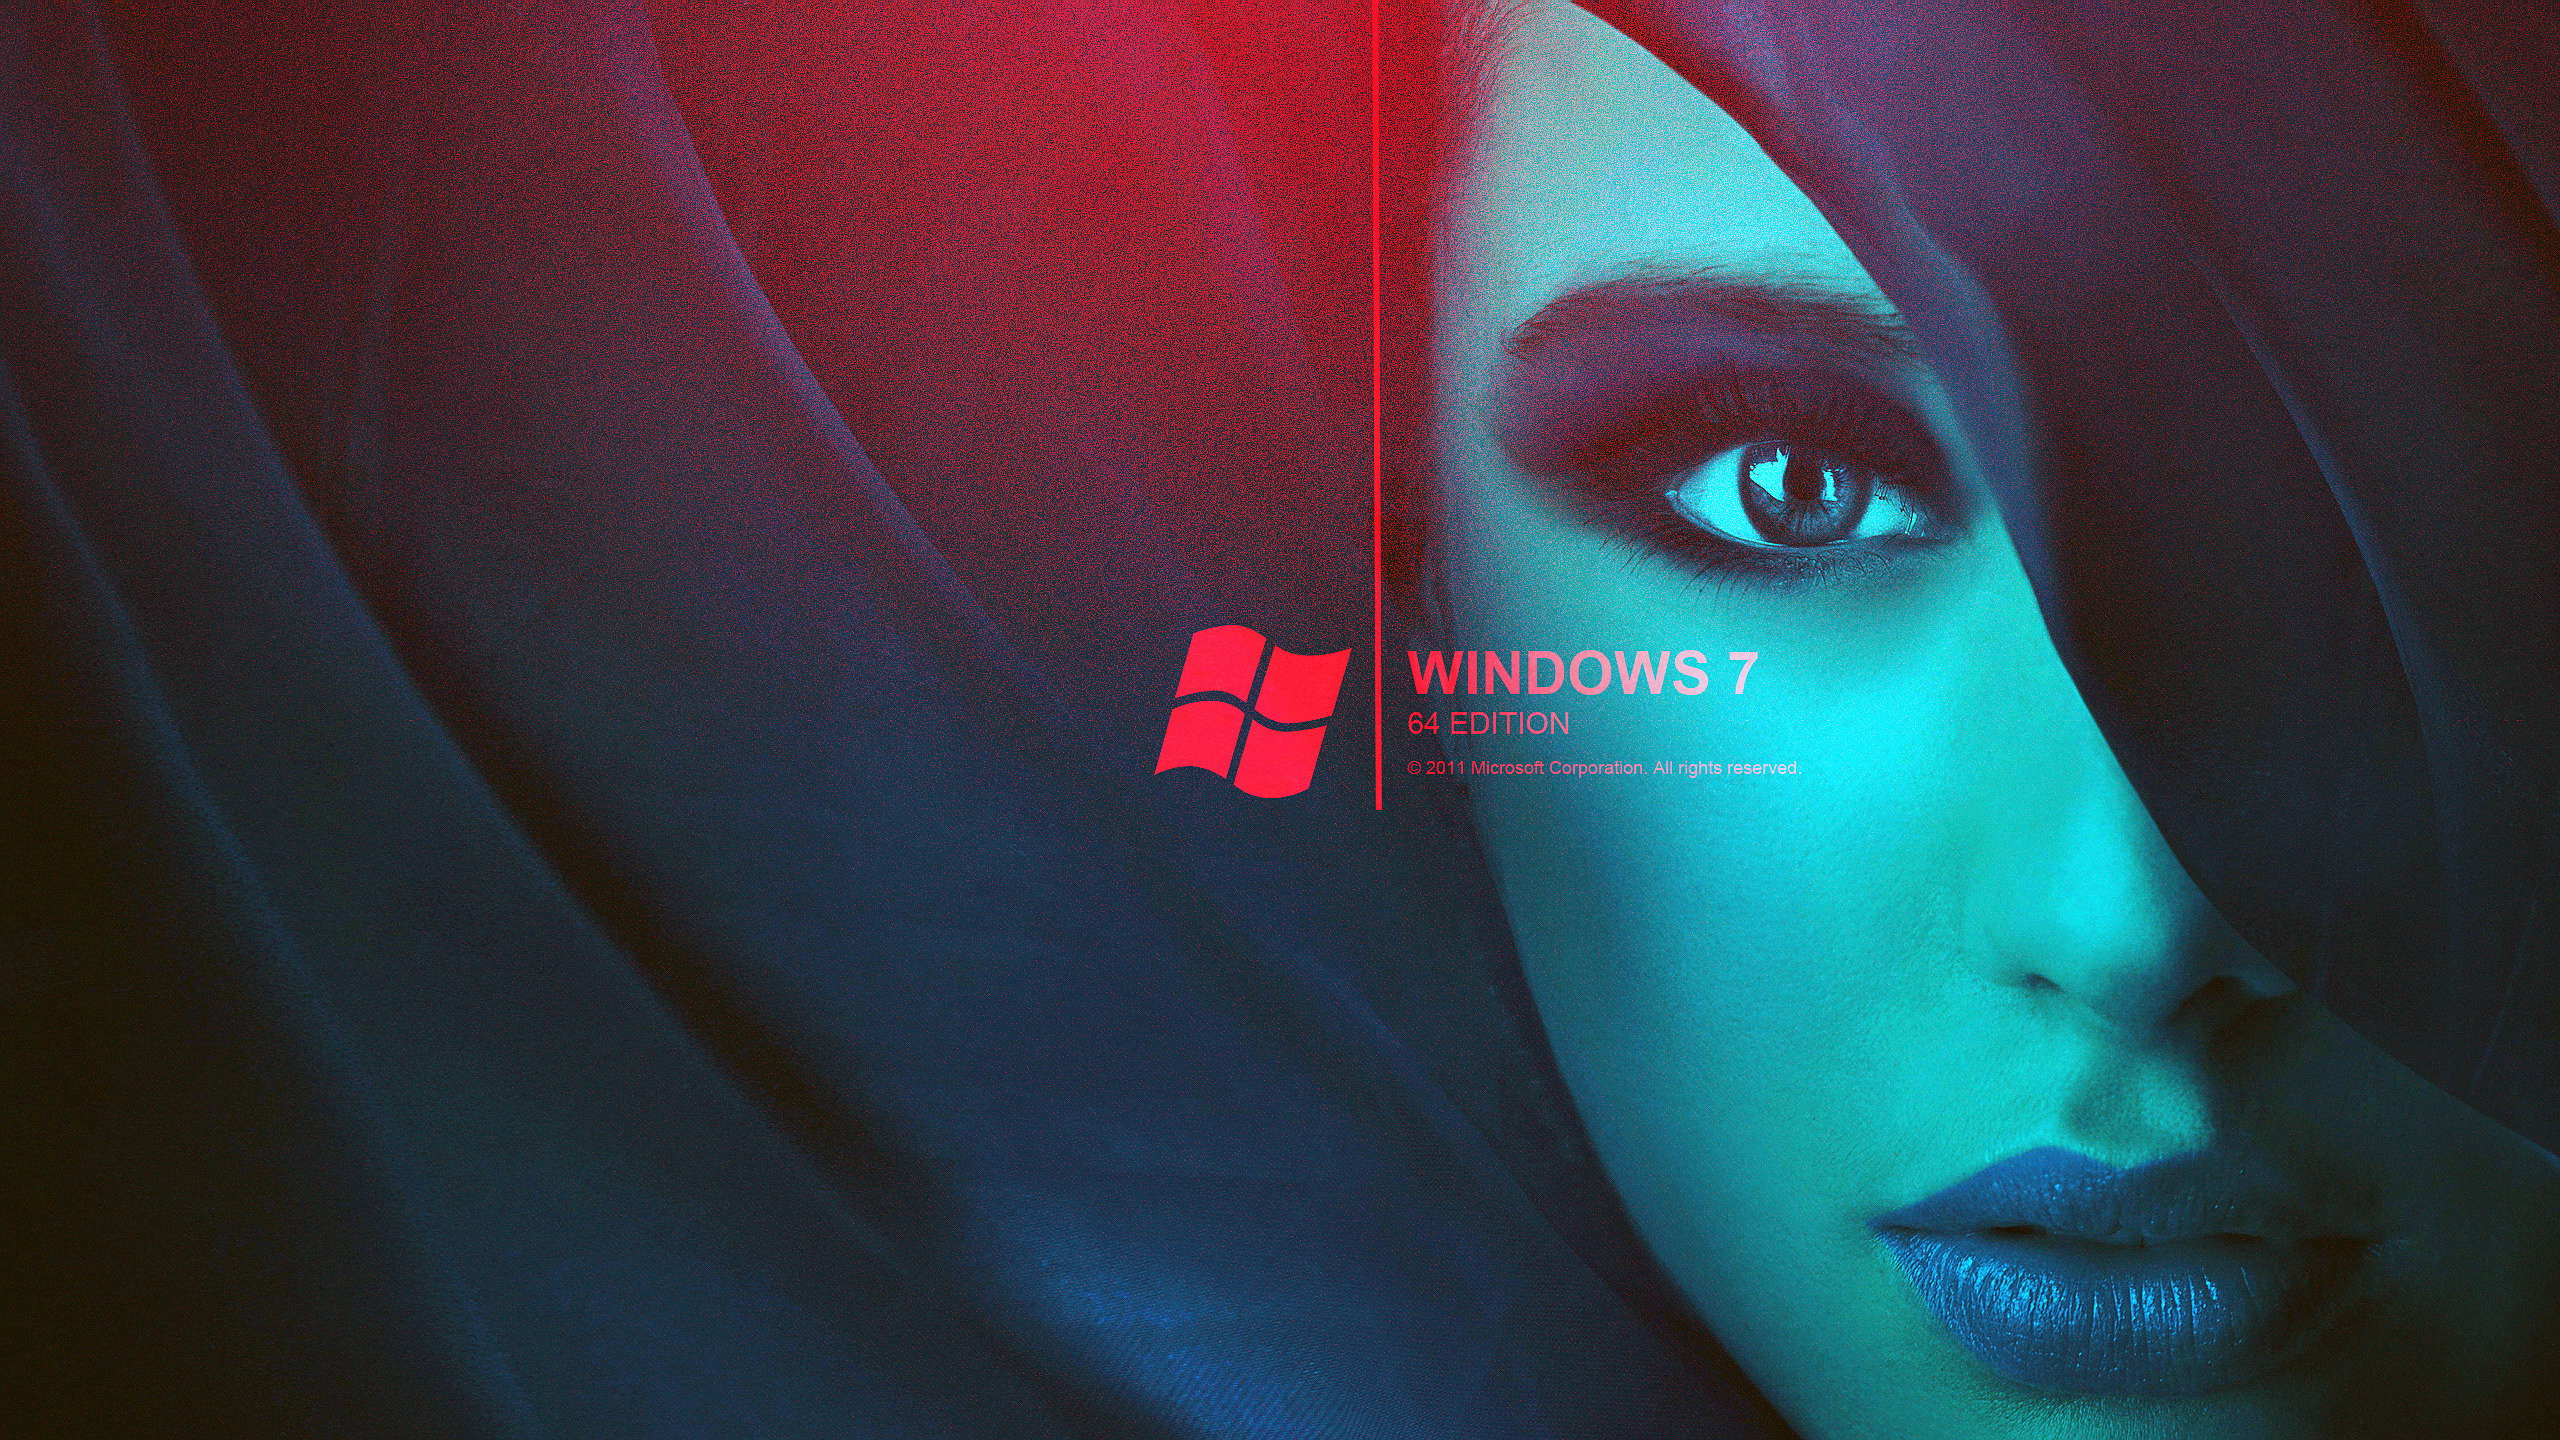 fond écran pc windows 7